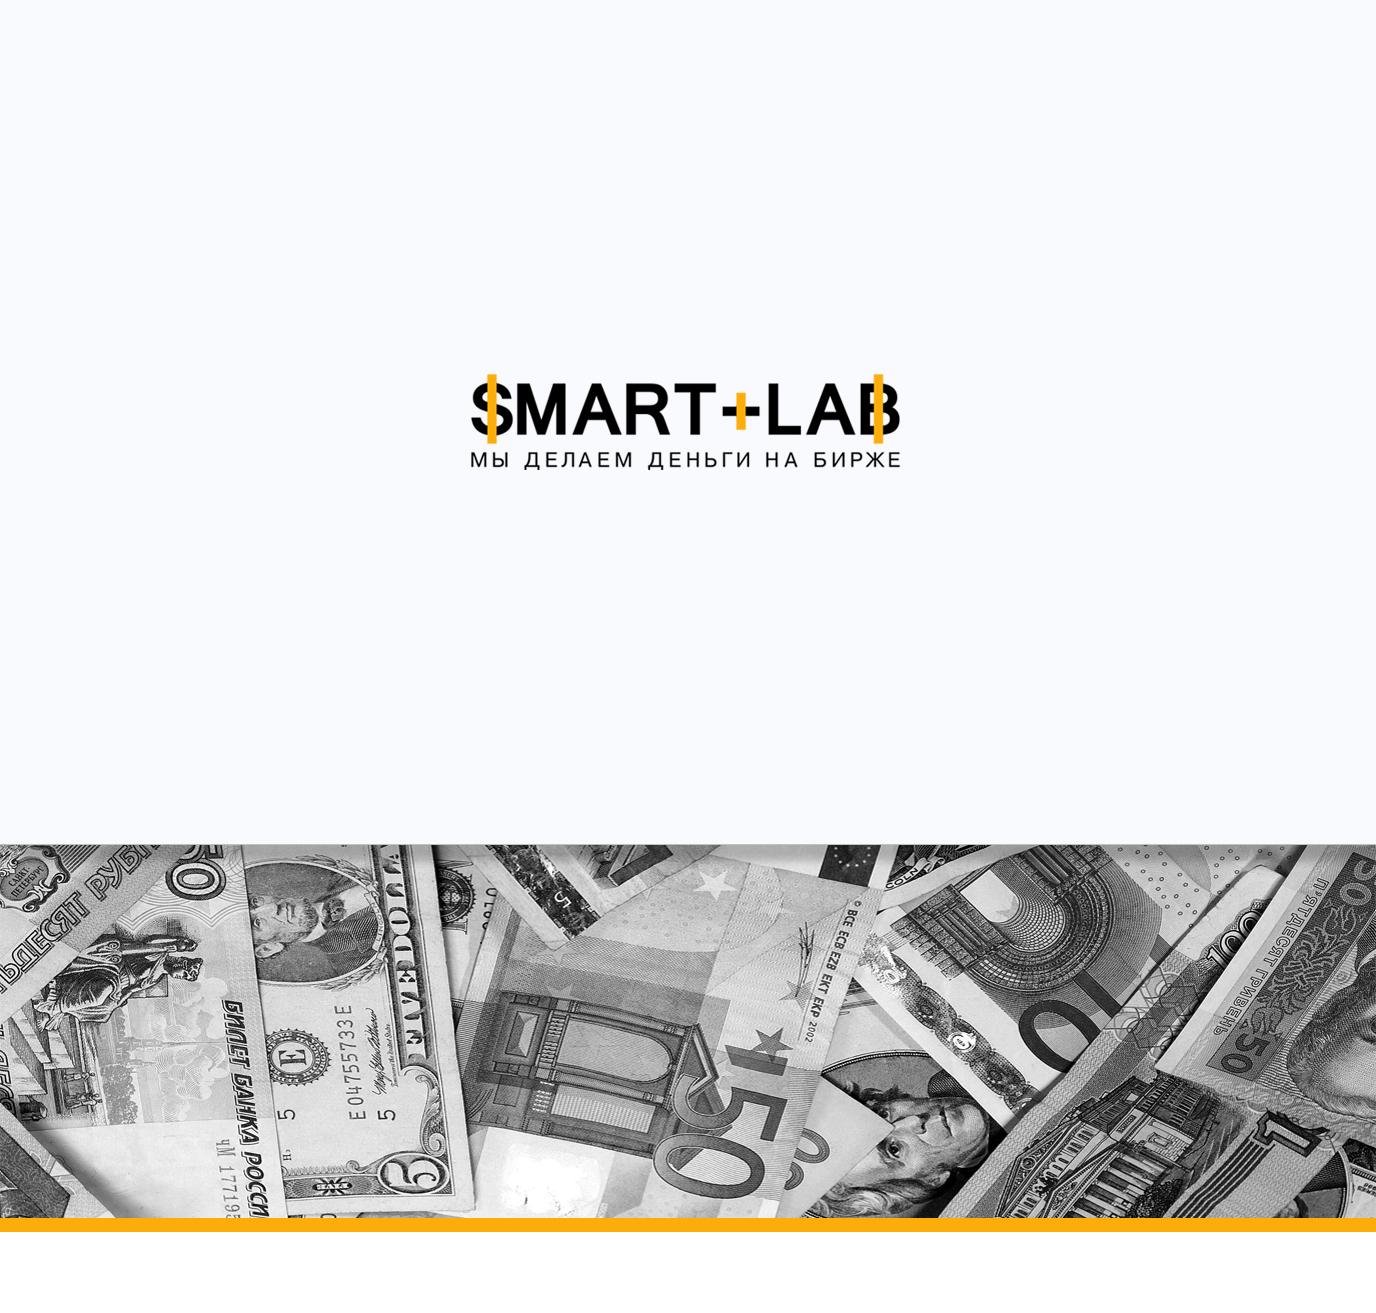 http://id1.ru/wp-content/uploads/2015/09/smart-lab.jpg